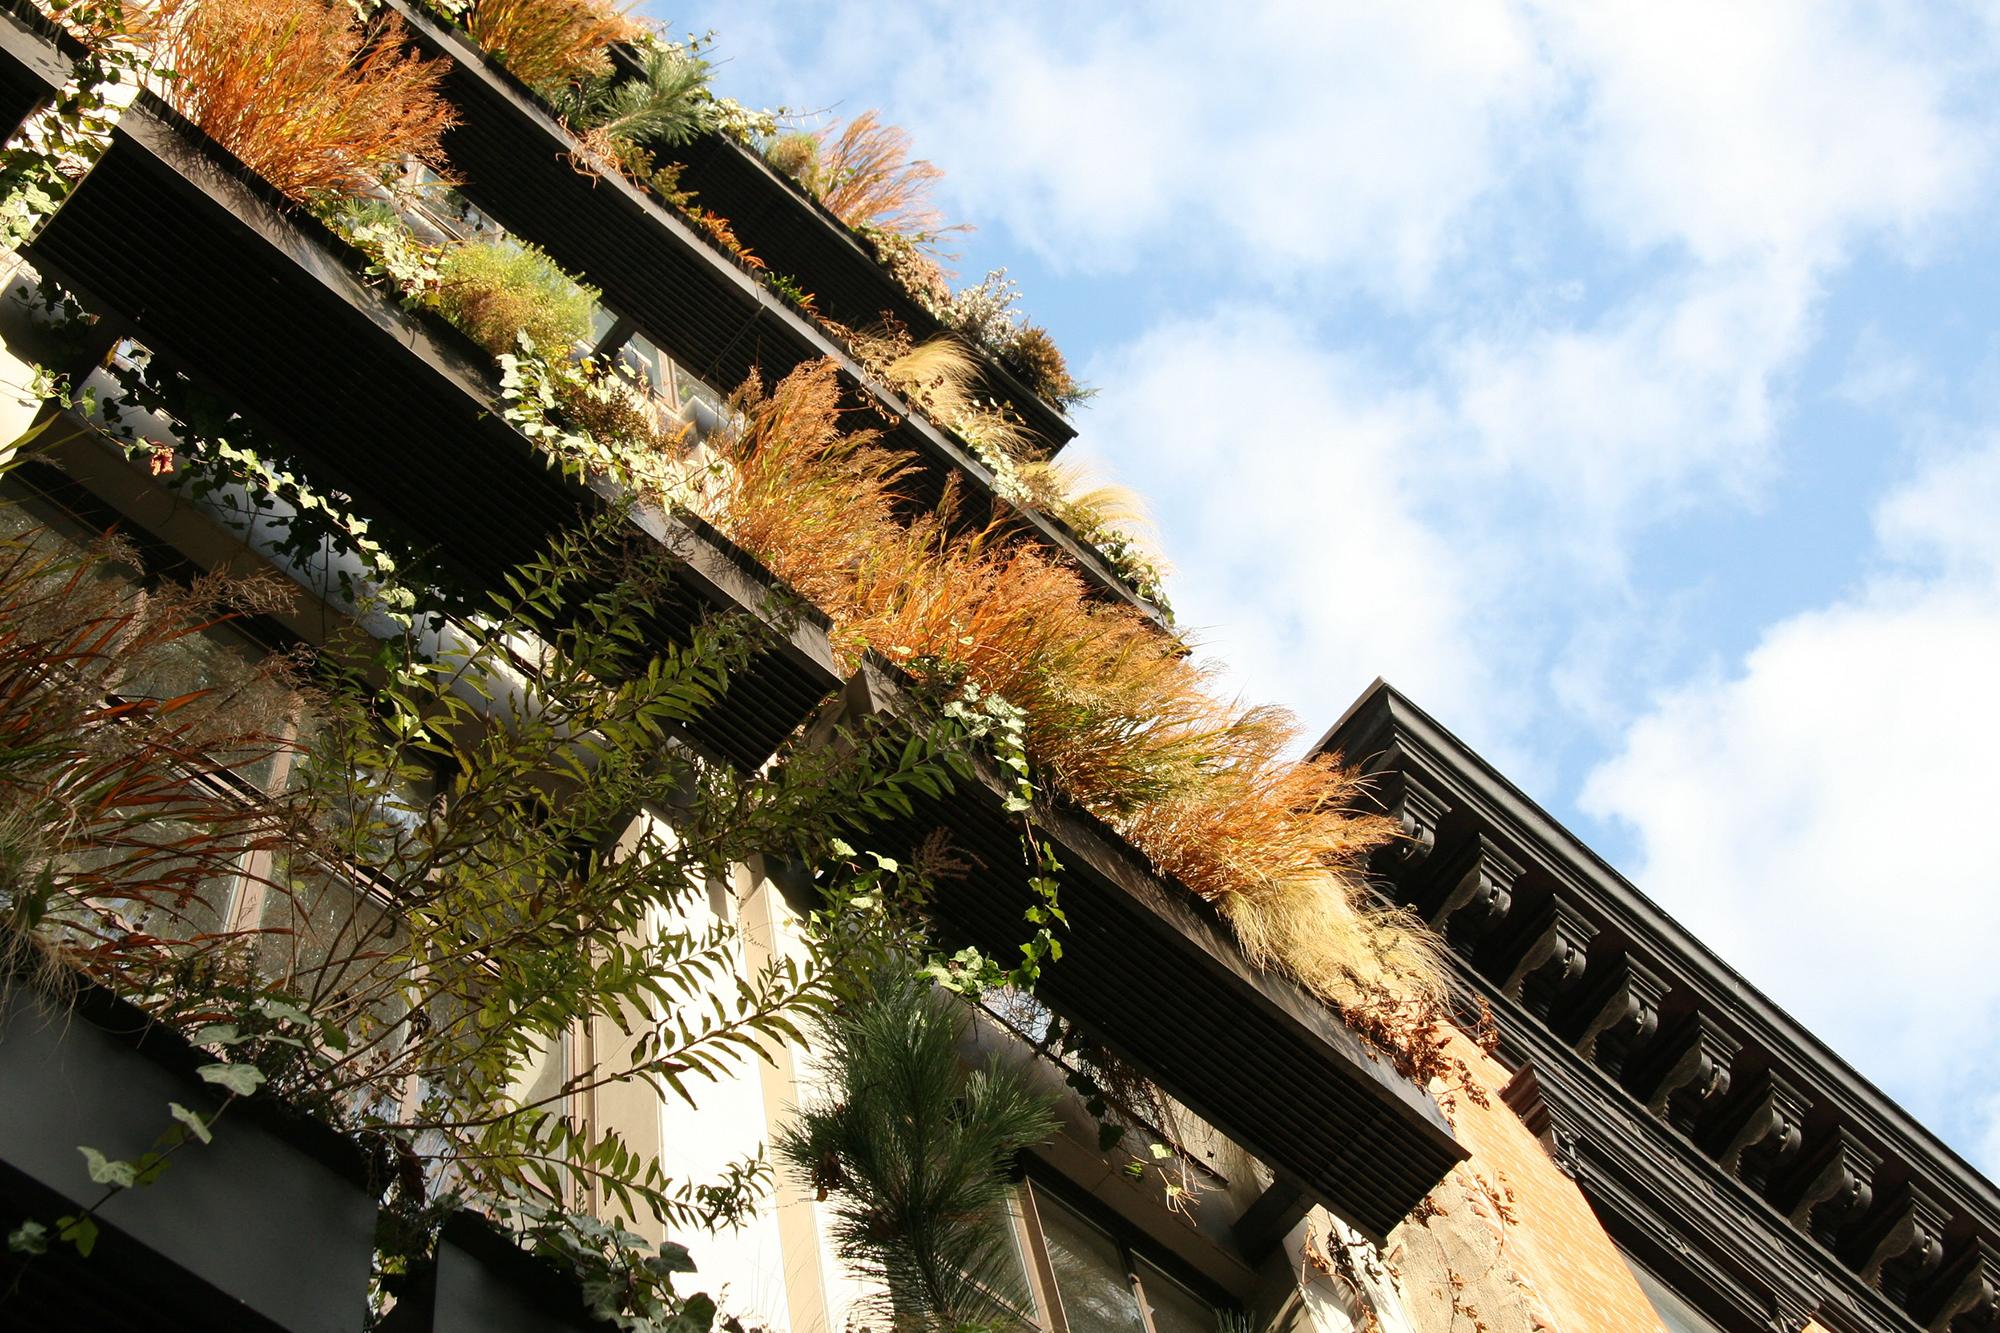 VERDANT, The Flowerbox Building, Mac Carbonell designer, Contemporary landscape, New York landscape design